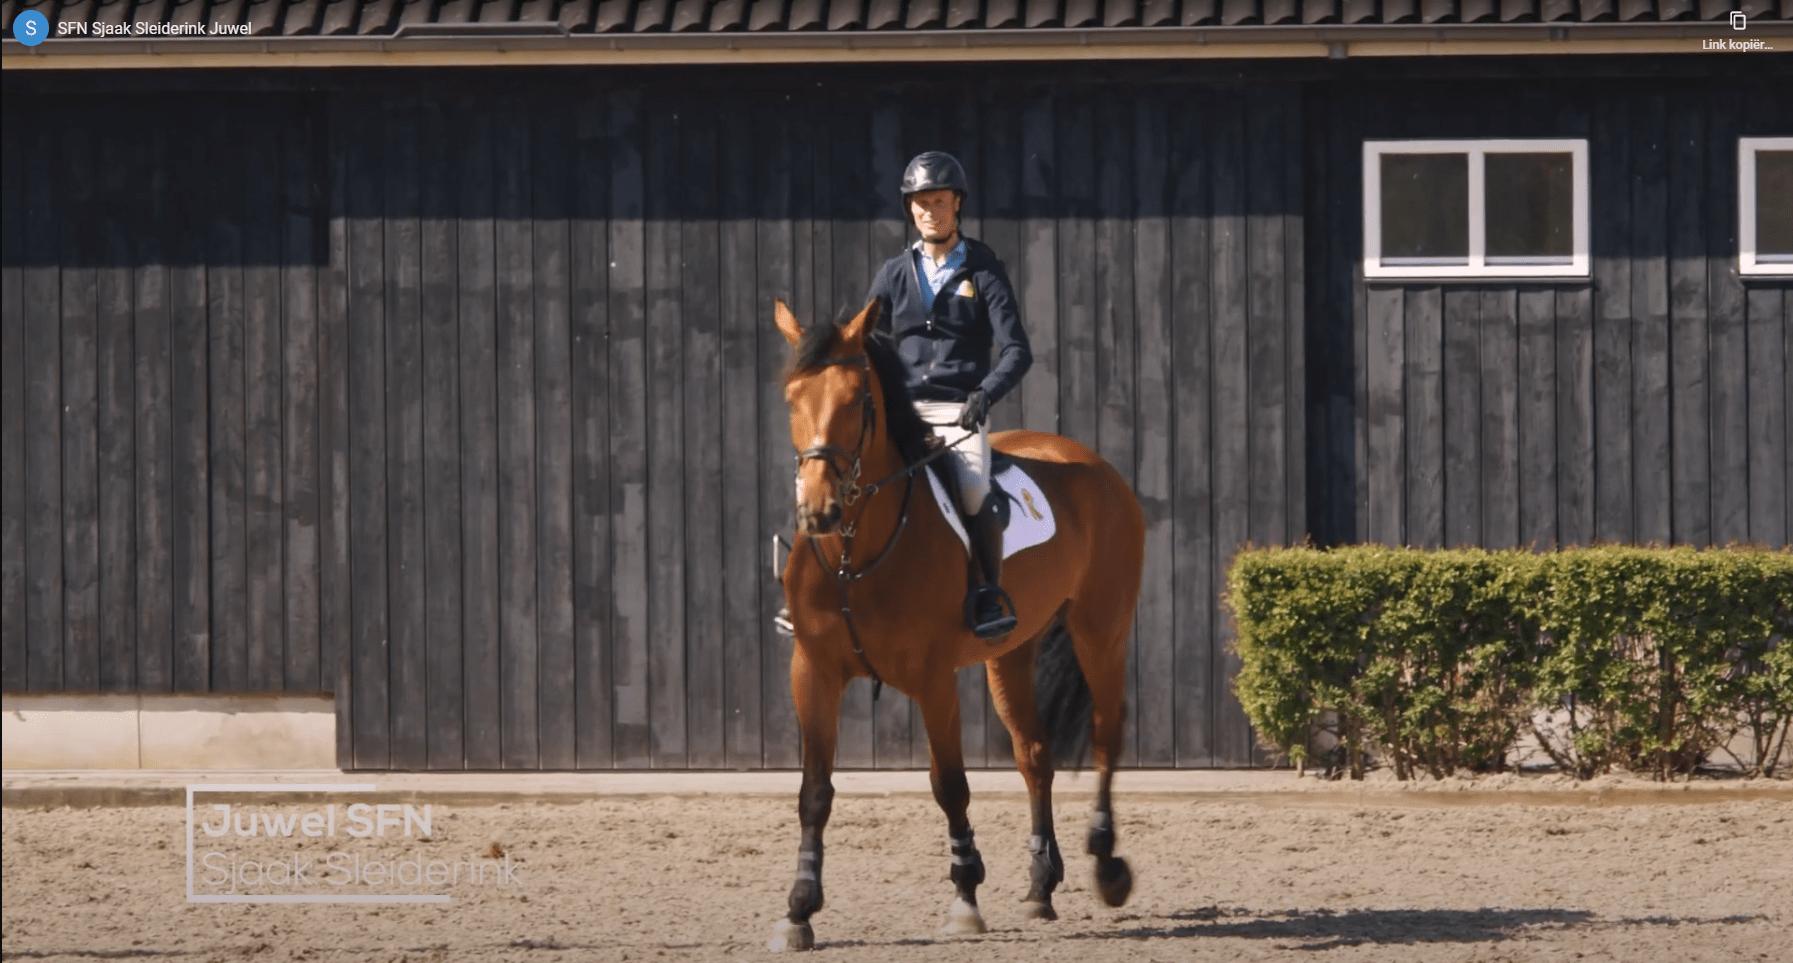 SFN Springpaardenfonds Nederland